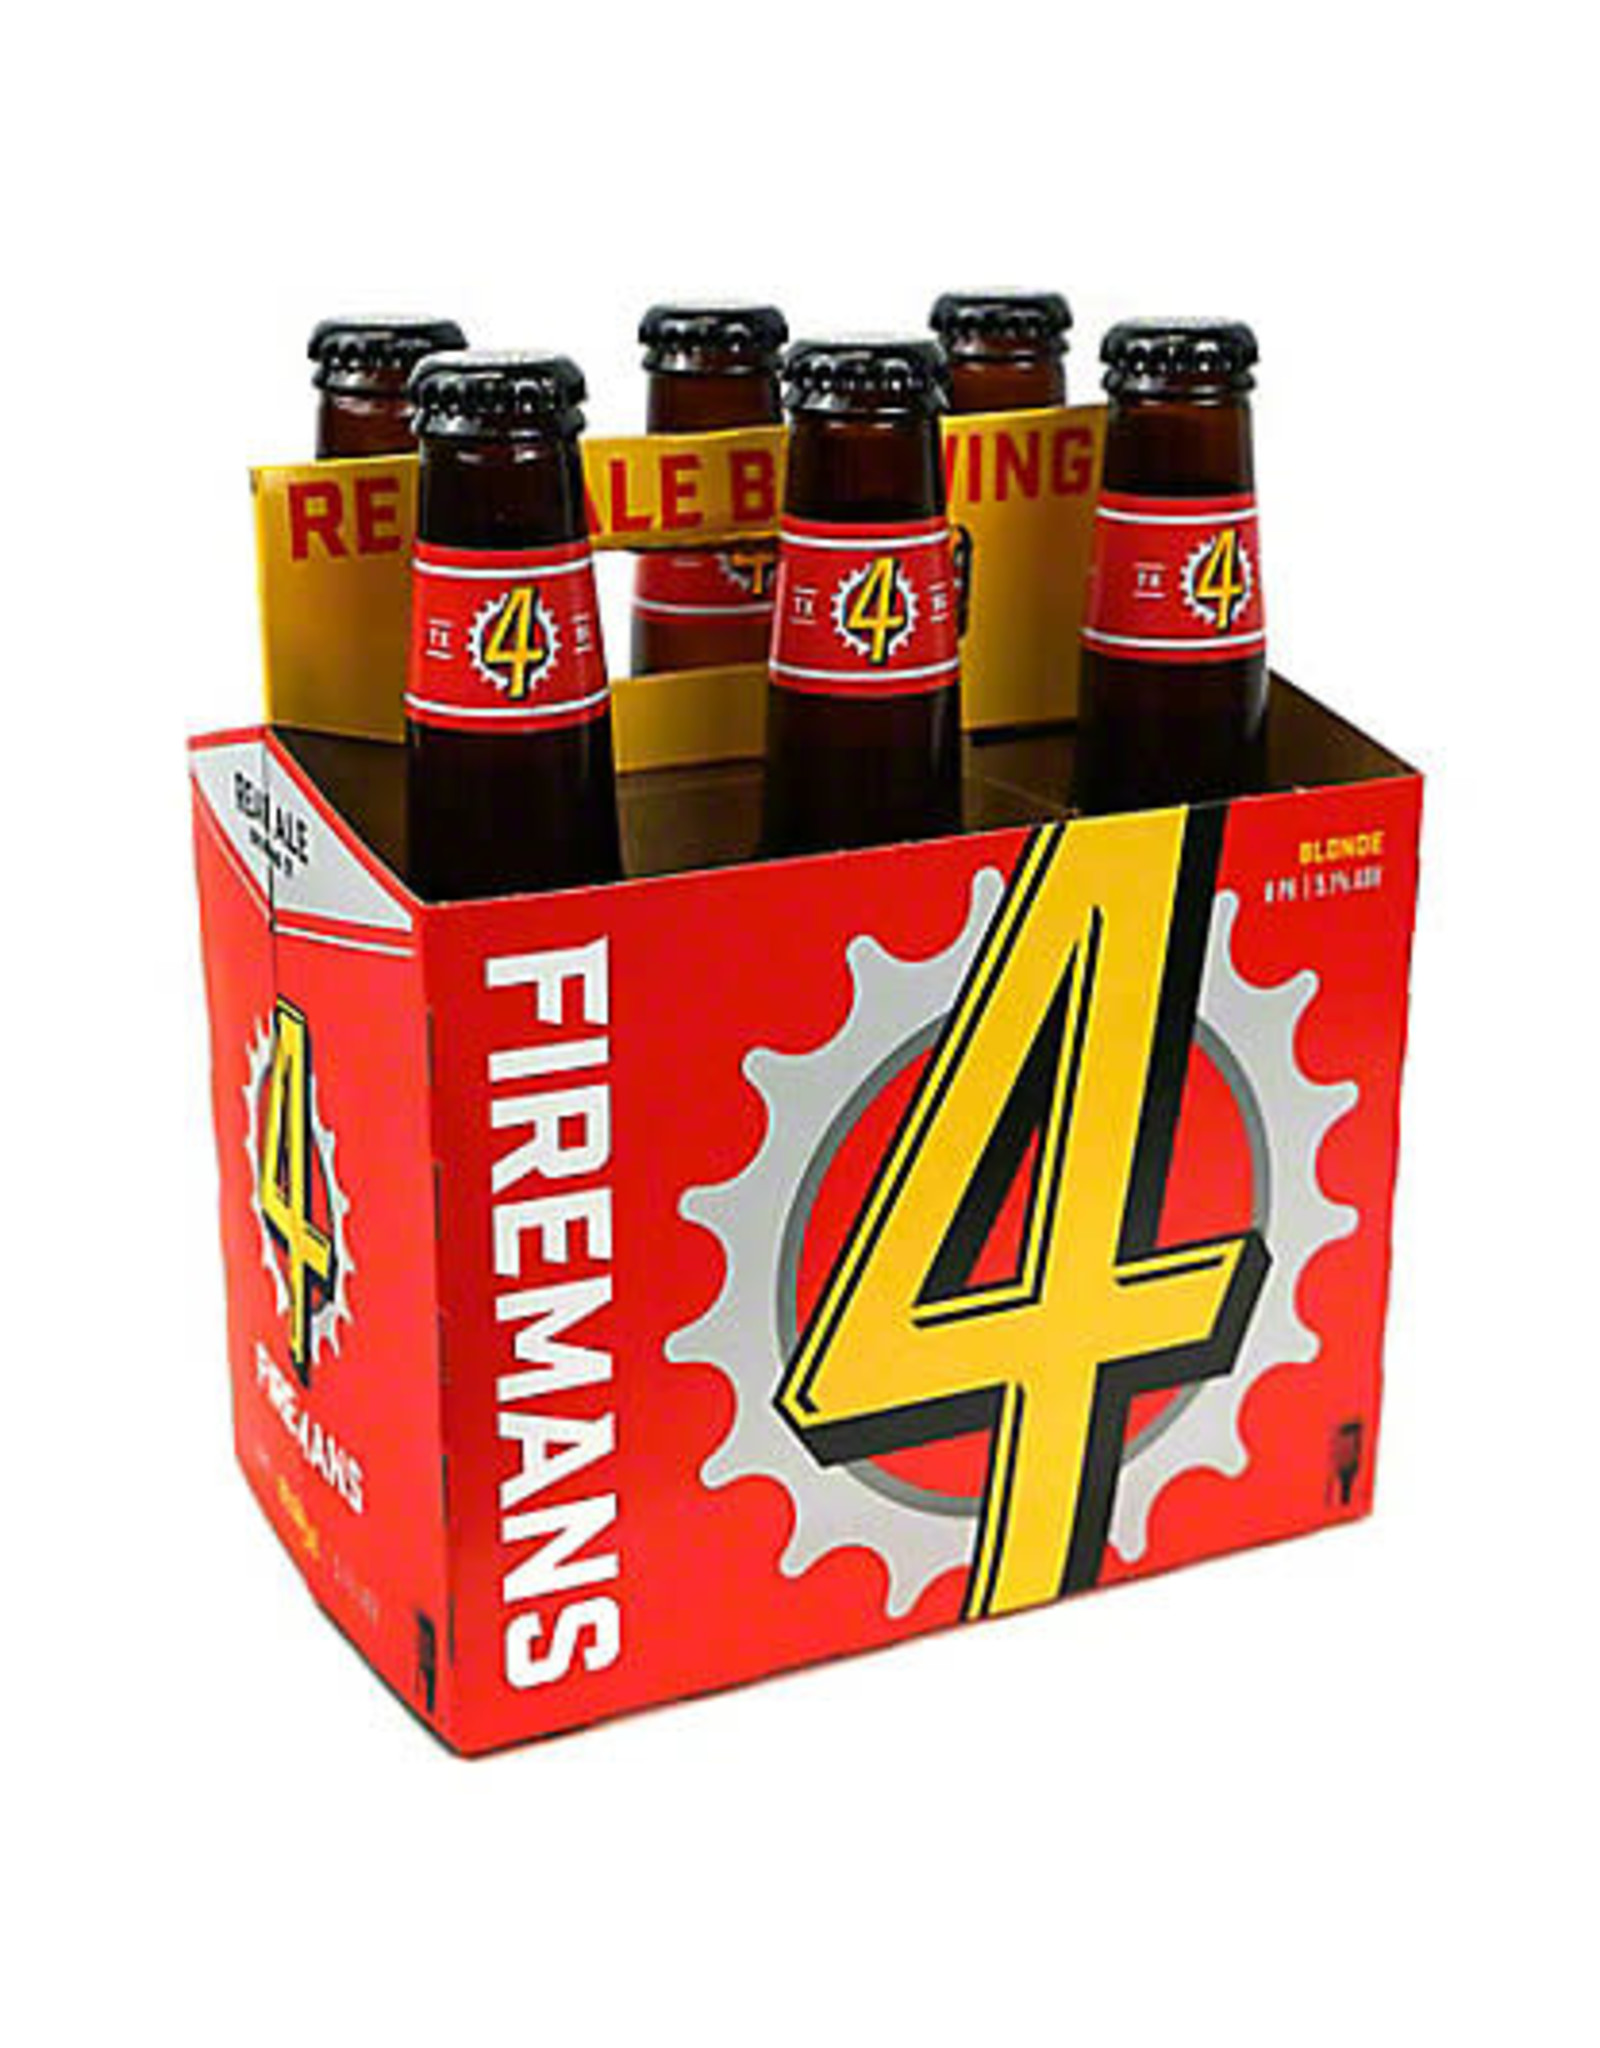 FIREMANS #4 4-6-12NR